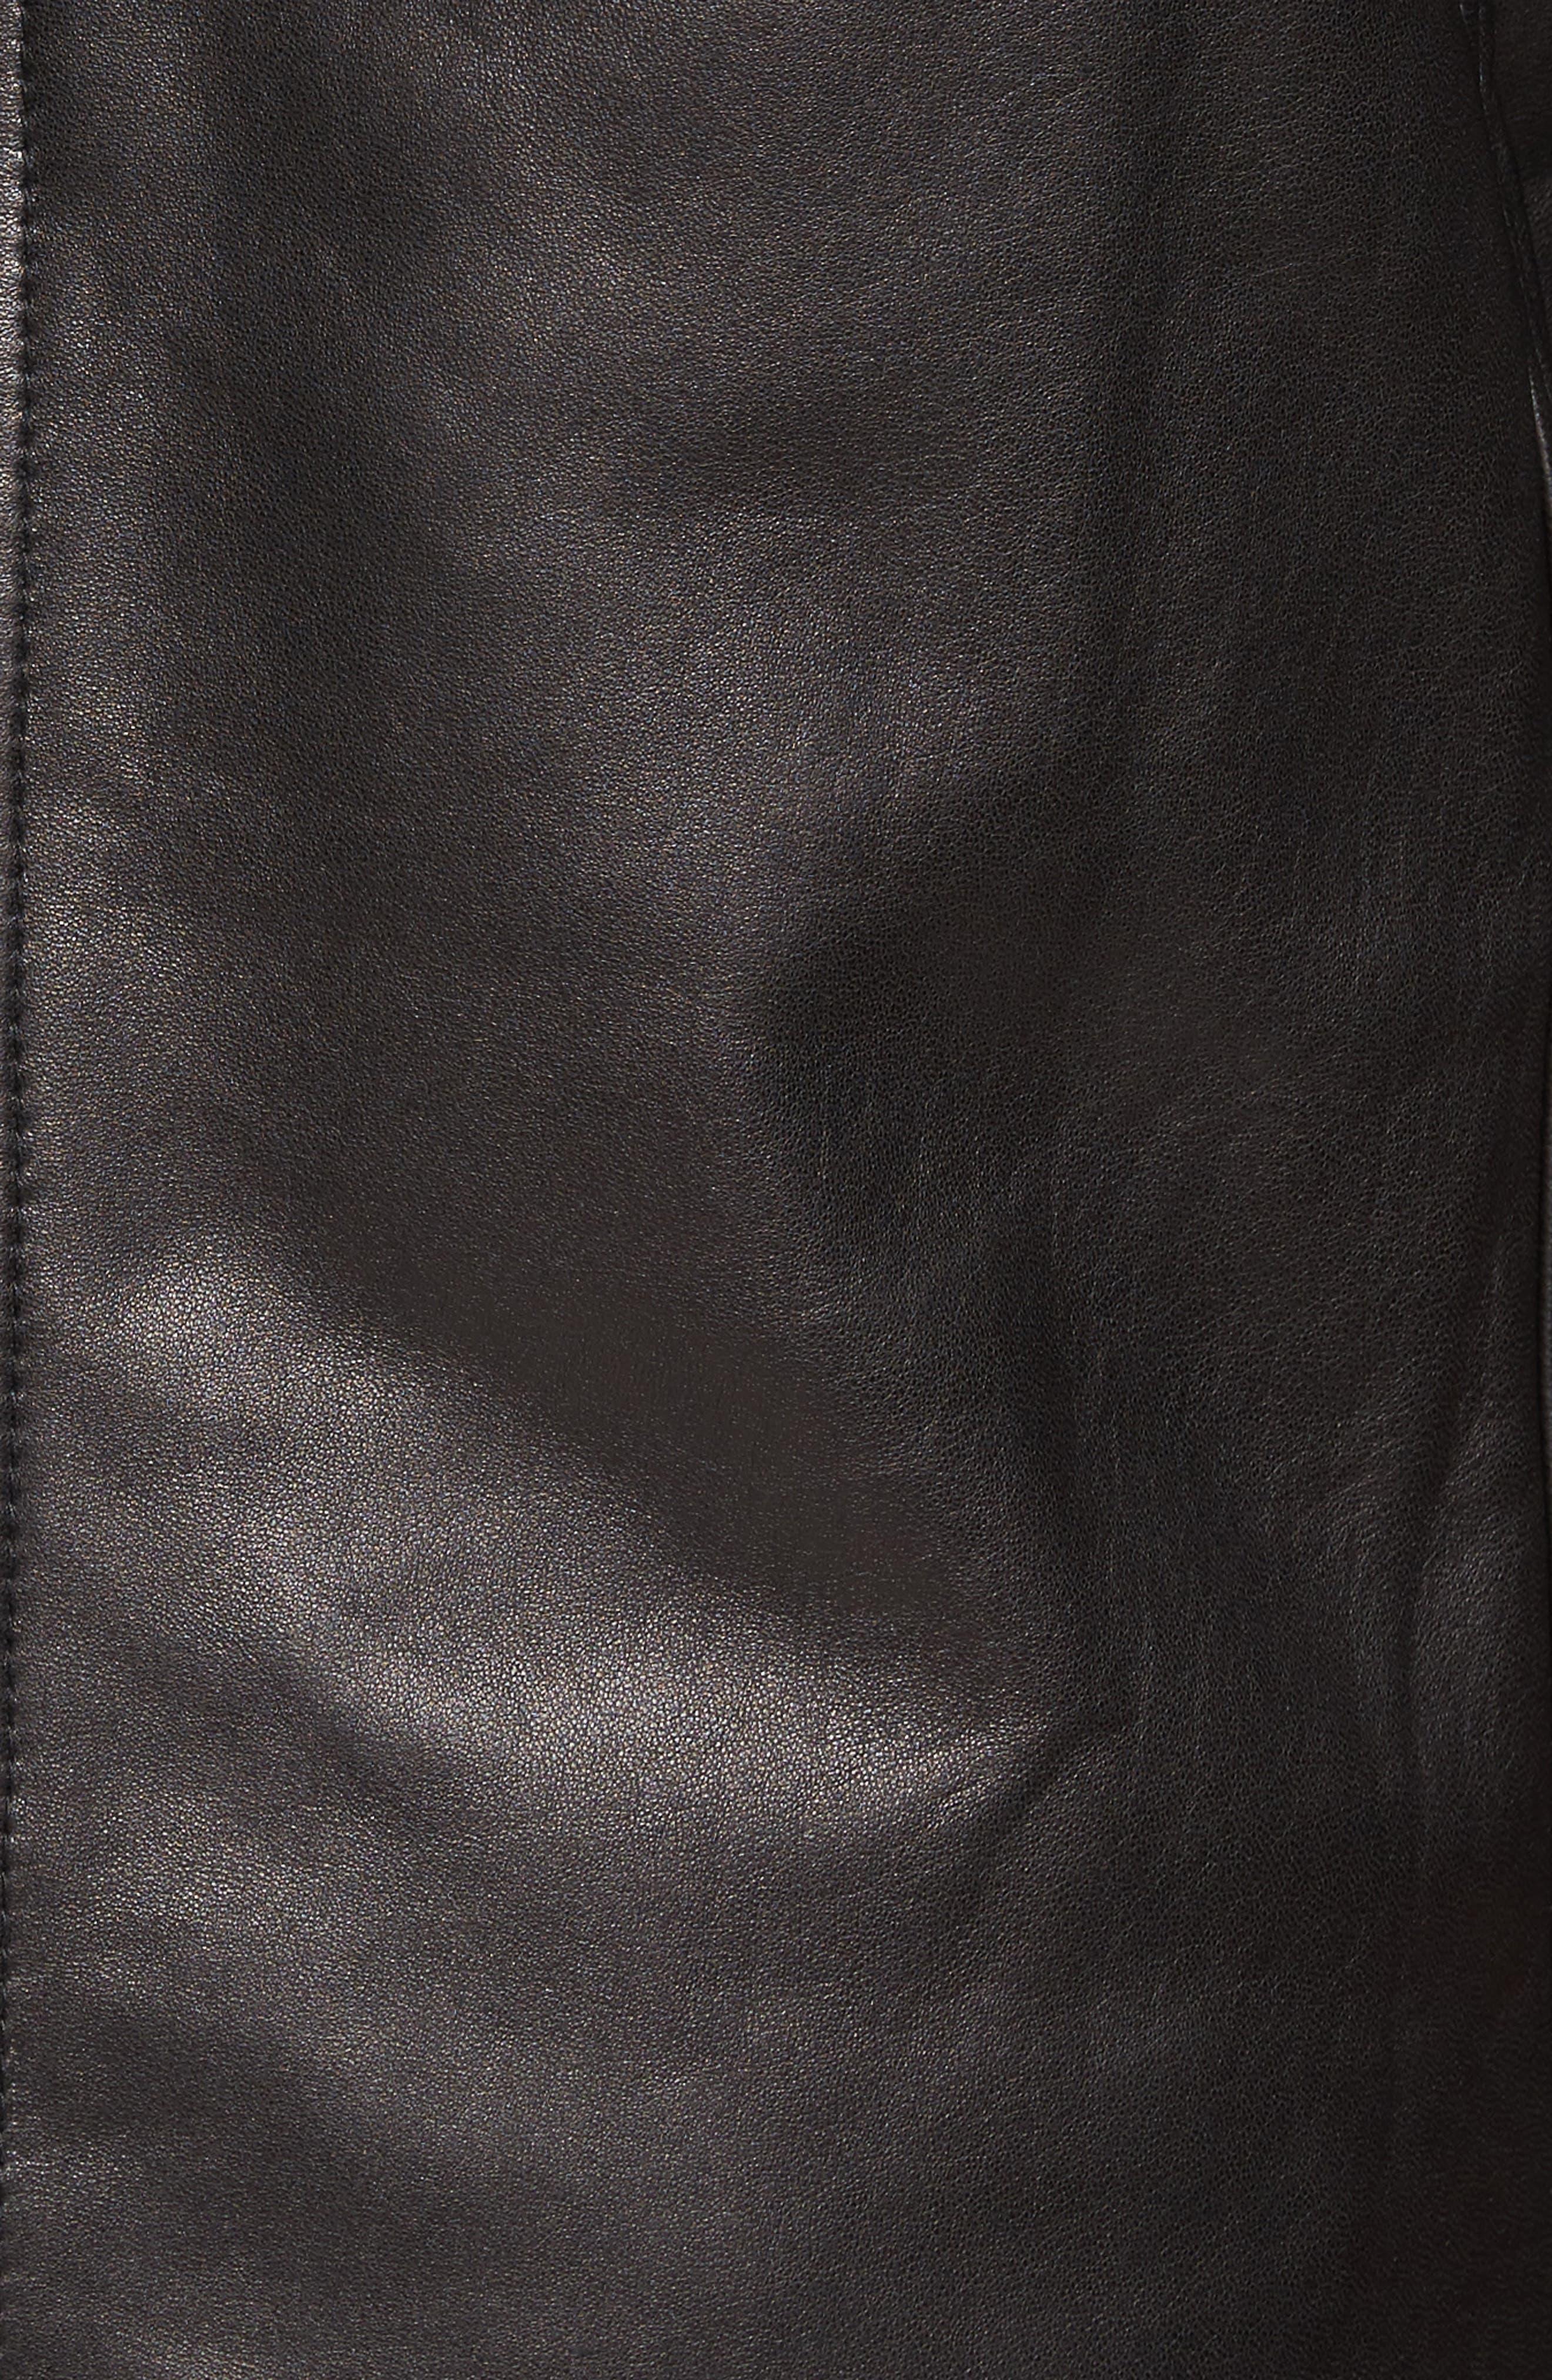 Lambskin Leather Jacket with Genuine Rabbit Fur Trim,                             Alternate thumbnail 9, color,